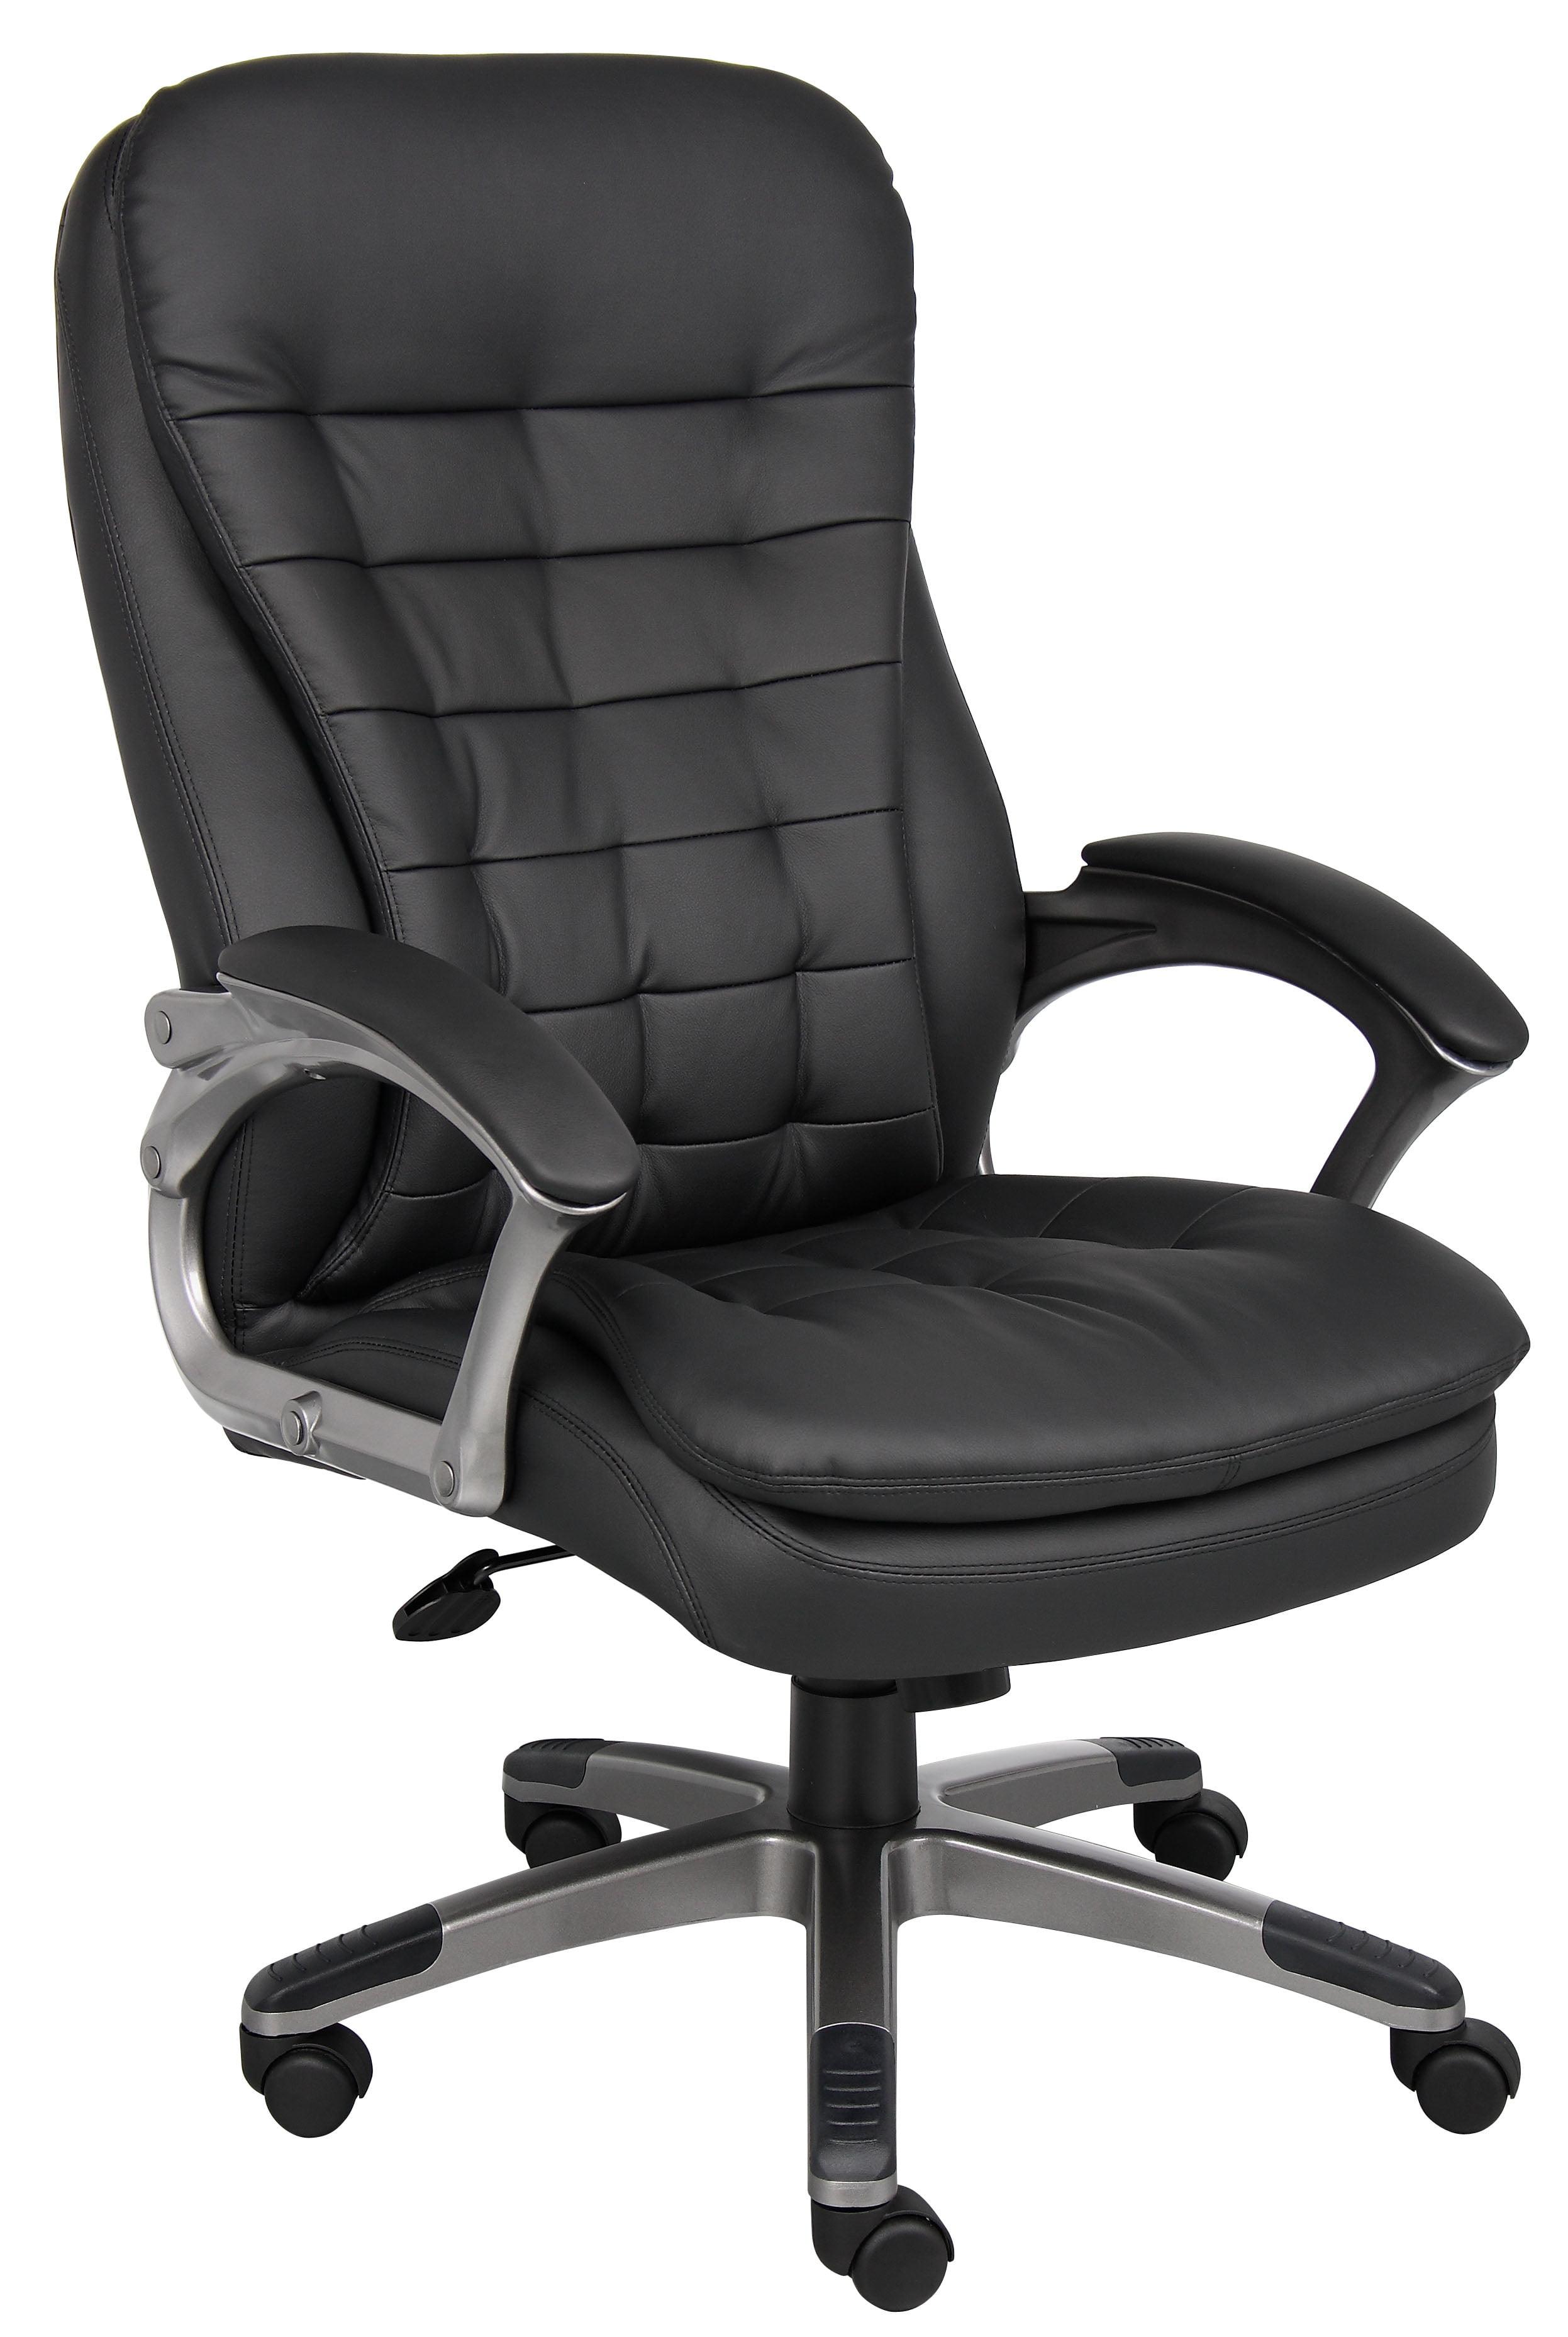 Boss Office U0026 Home Black High Back Executive Chair   Walmart.com